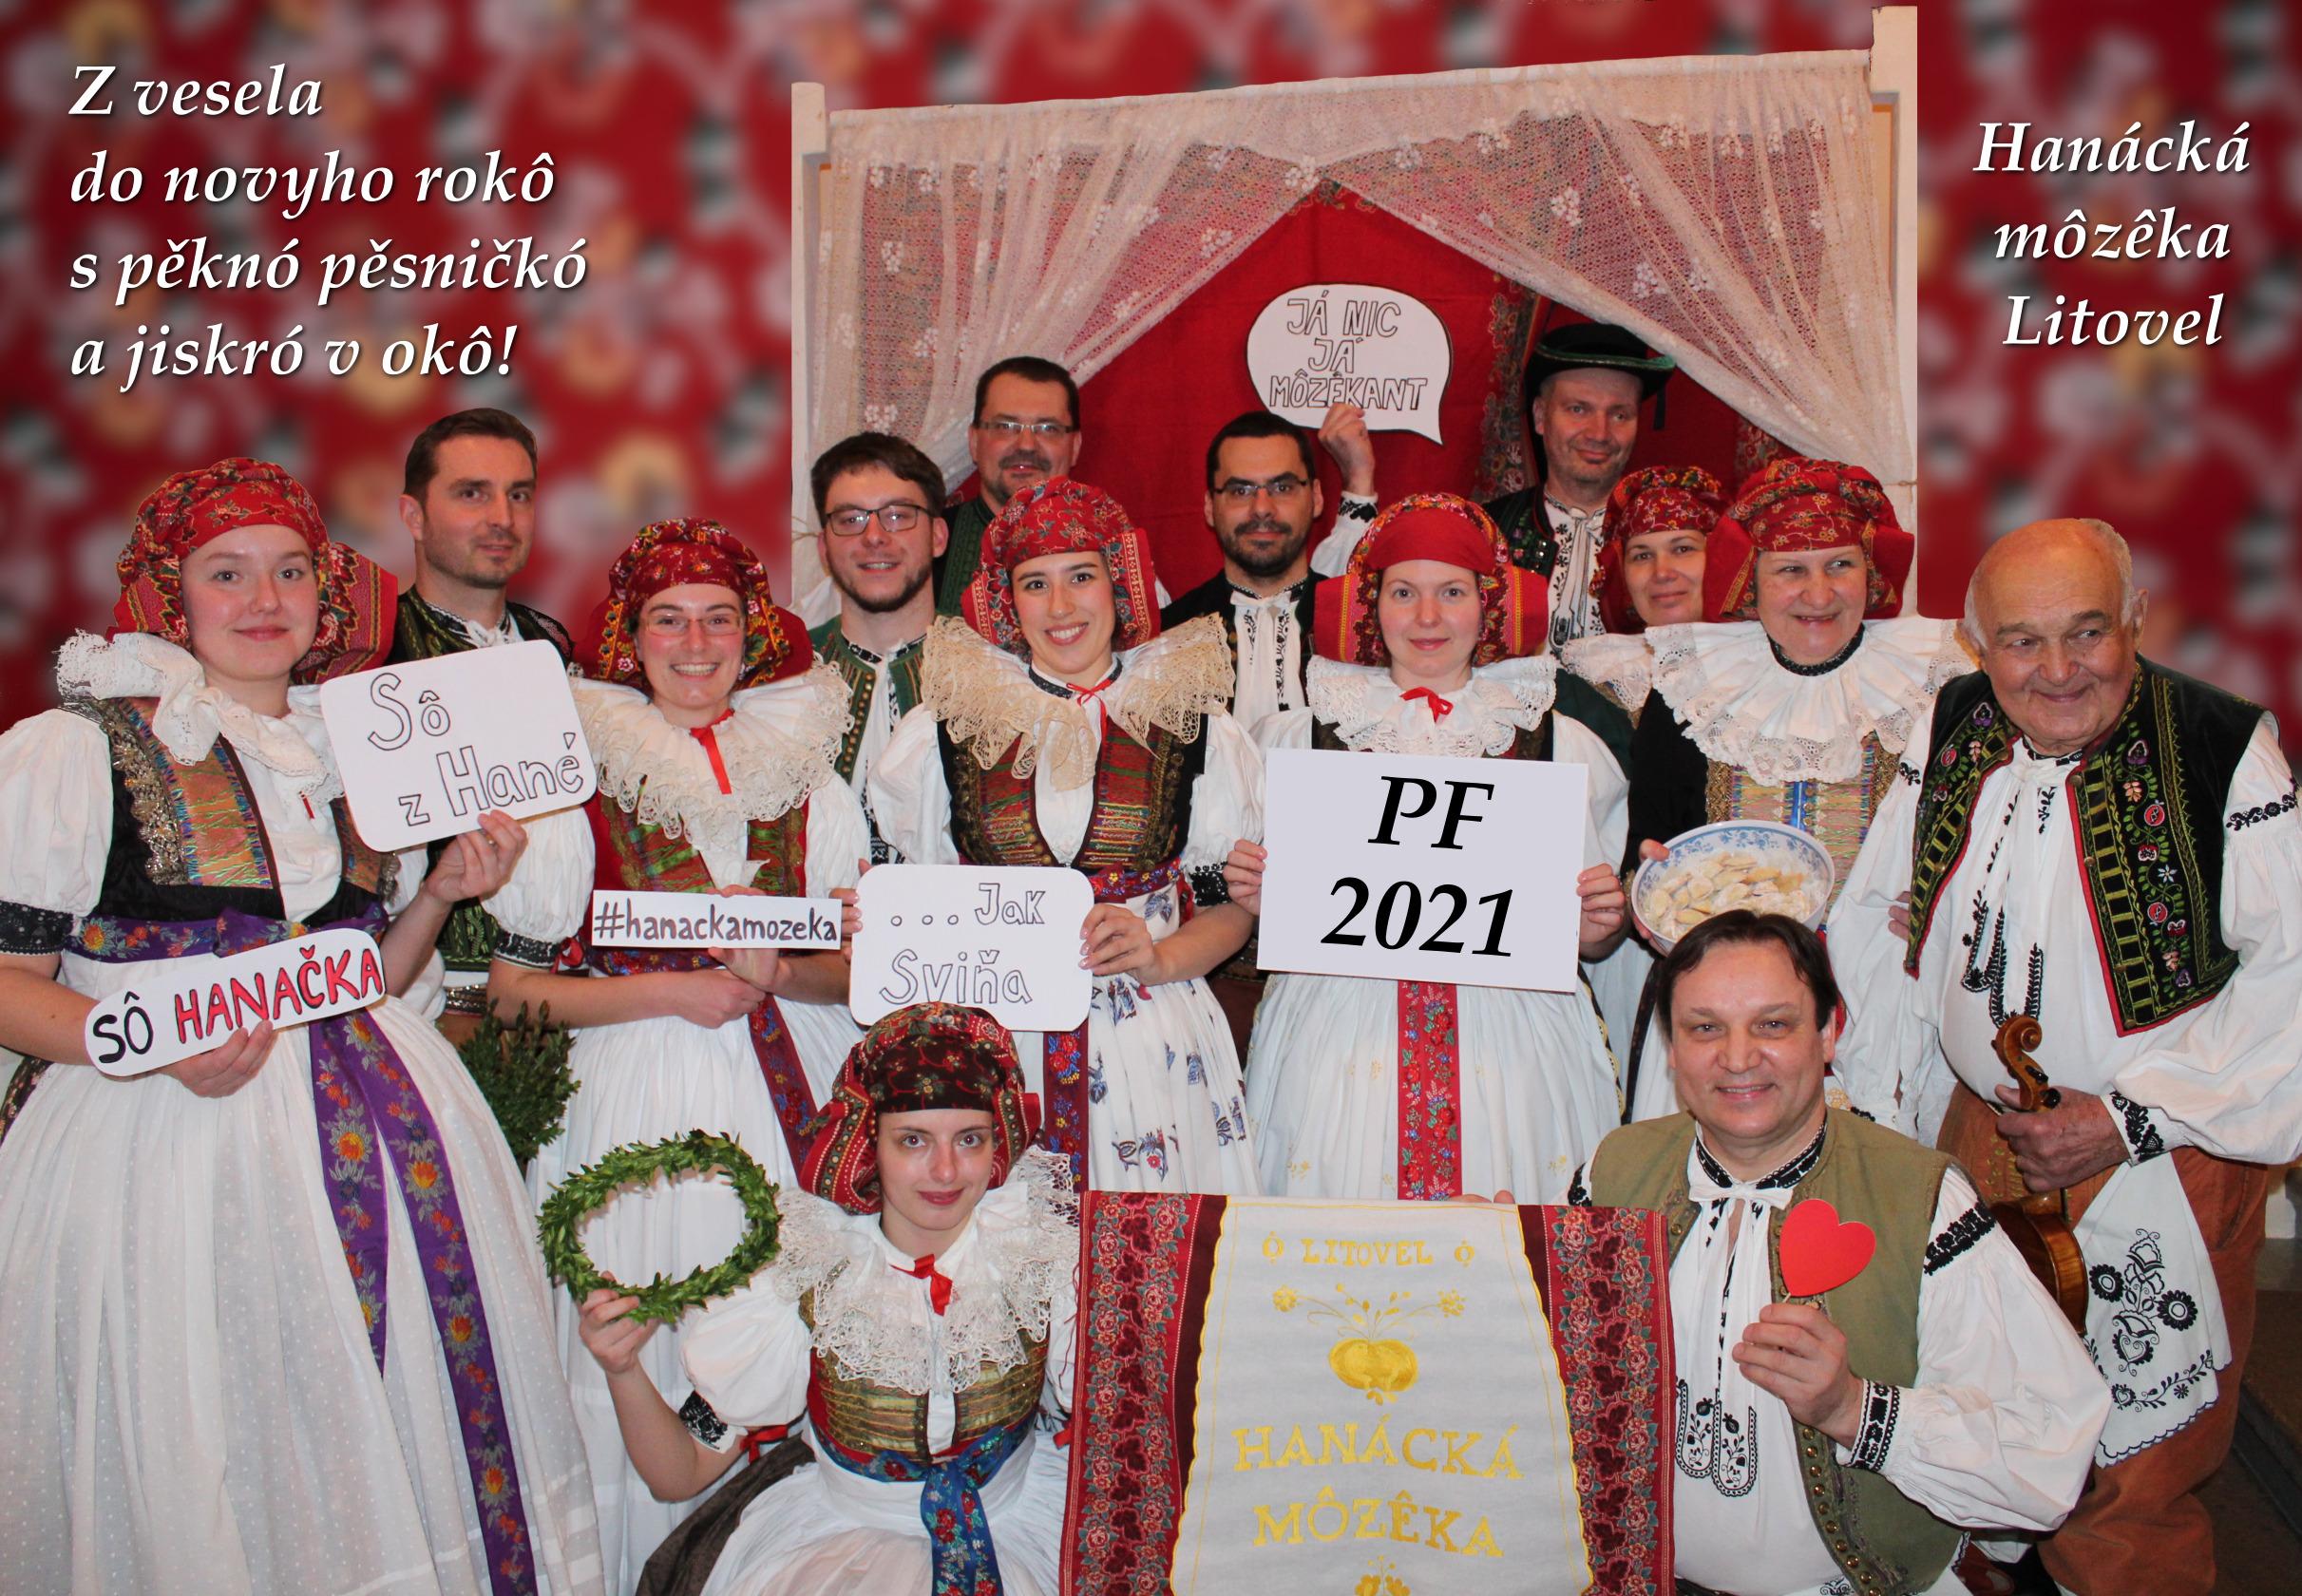 HML PF 2021